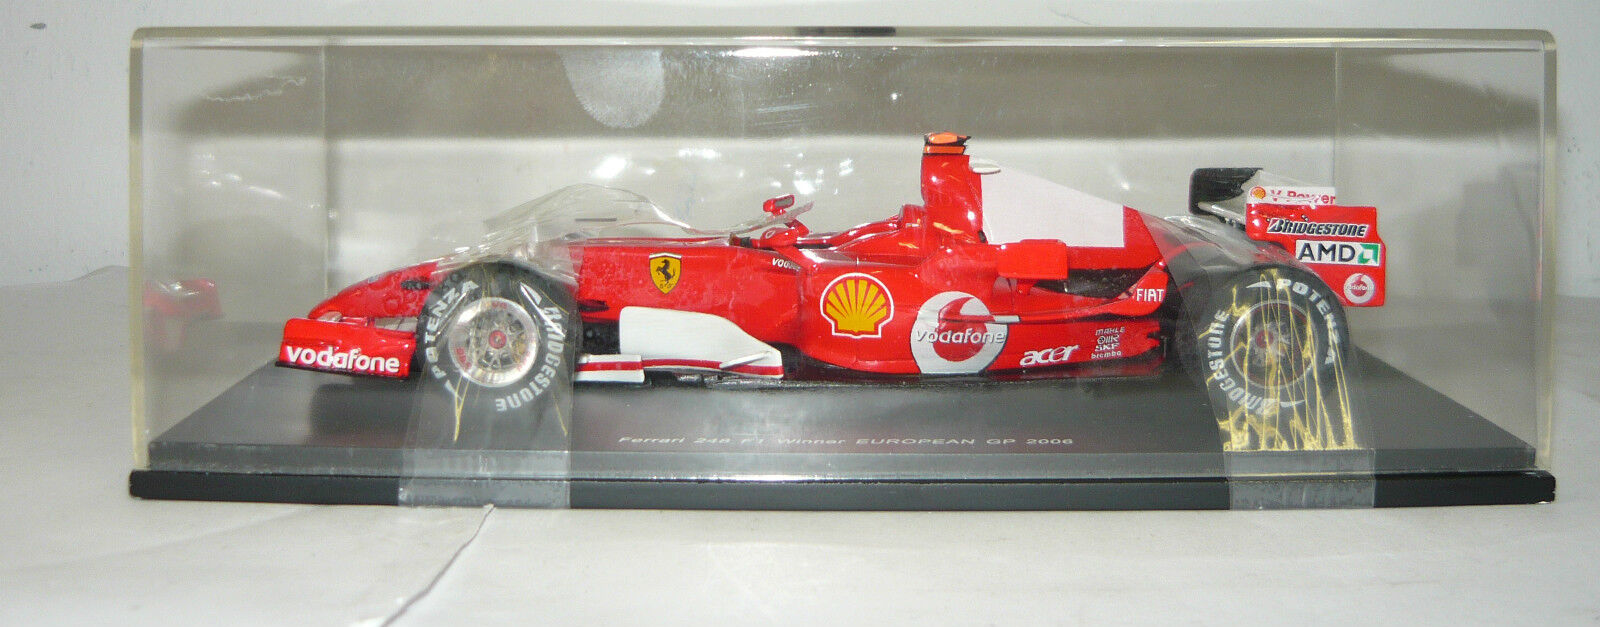 rossoline models 24rl007, ferrari 248 f1 gp2006, schumacher, 1 24, neu&ovp